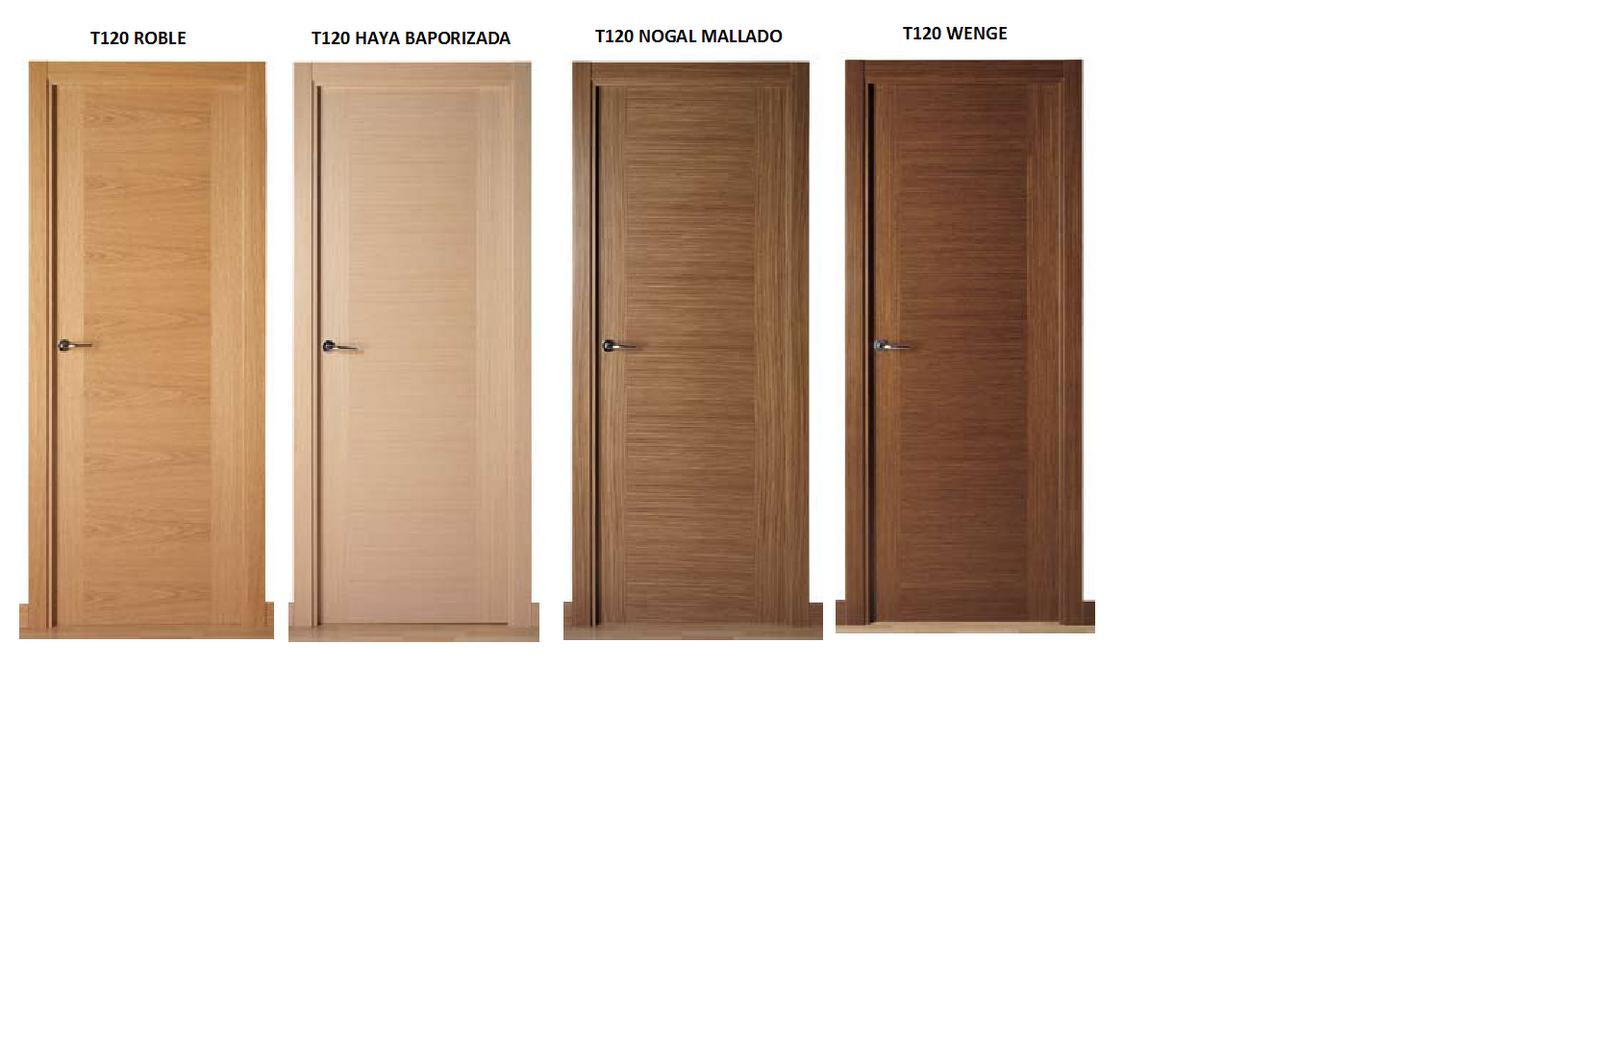 Carpinter a de madera mart n torralbo puertas for Puertas de madera modernas para interiores